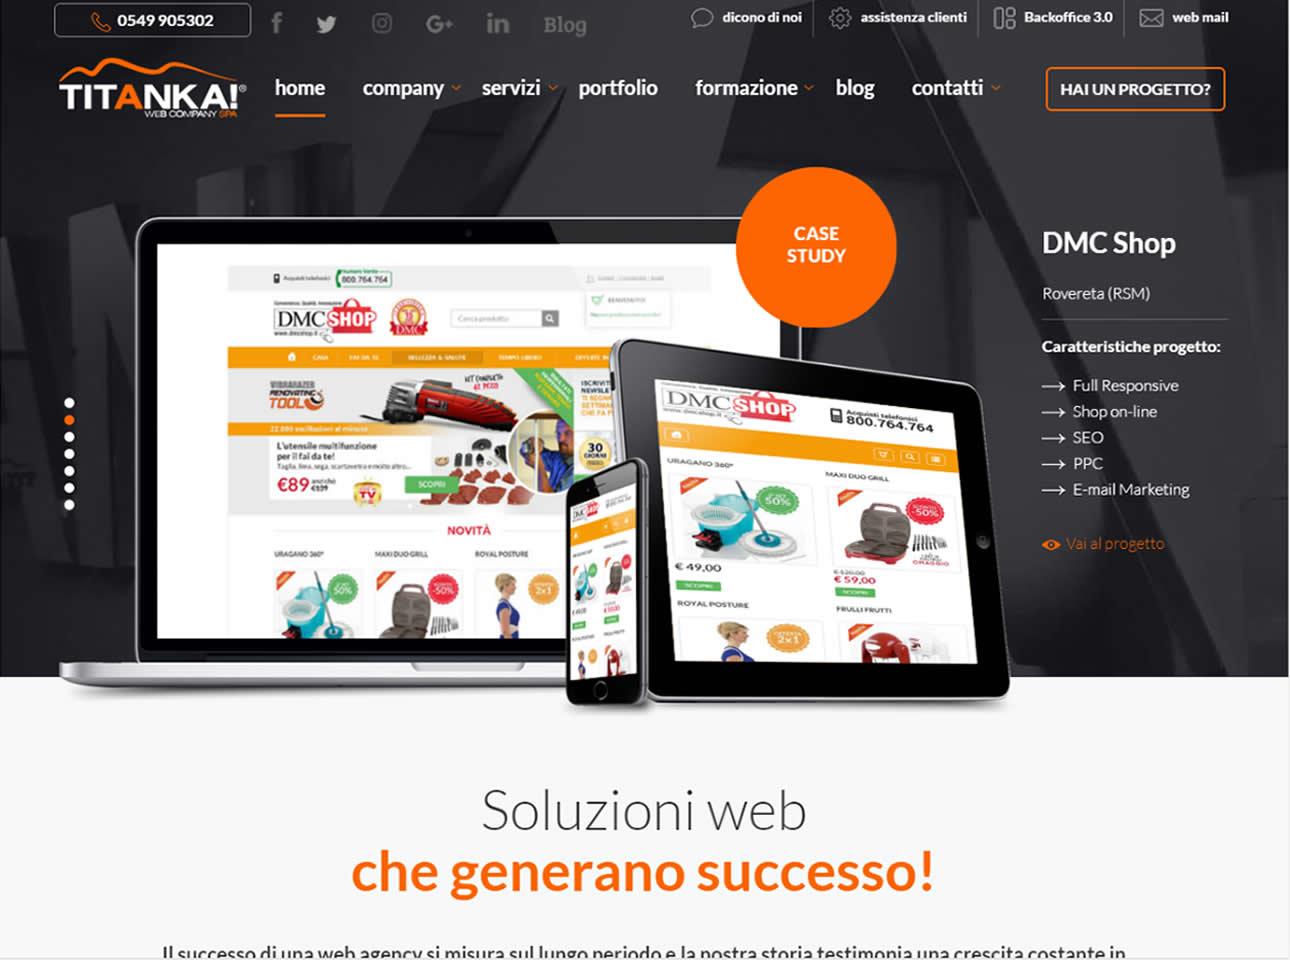 homepage-sito-titanka